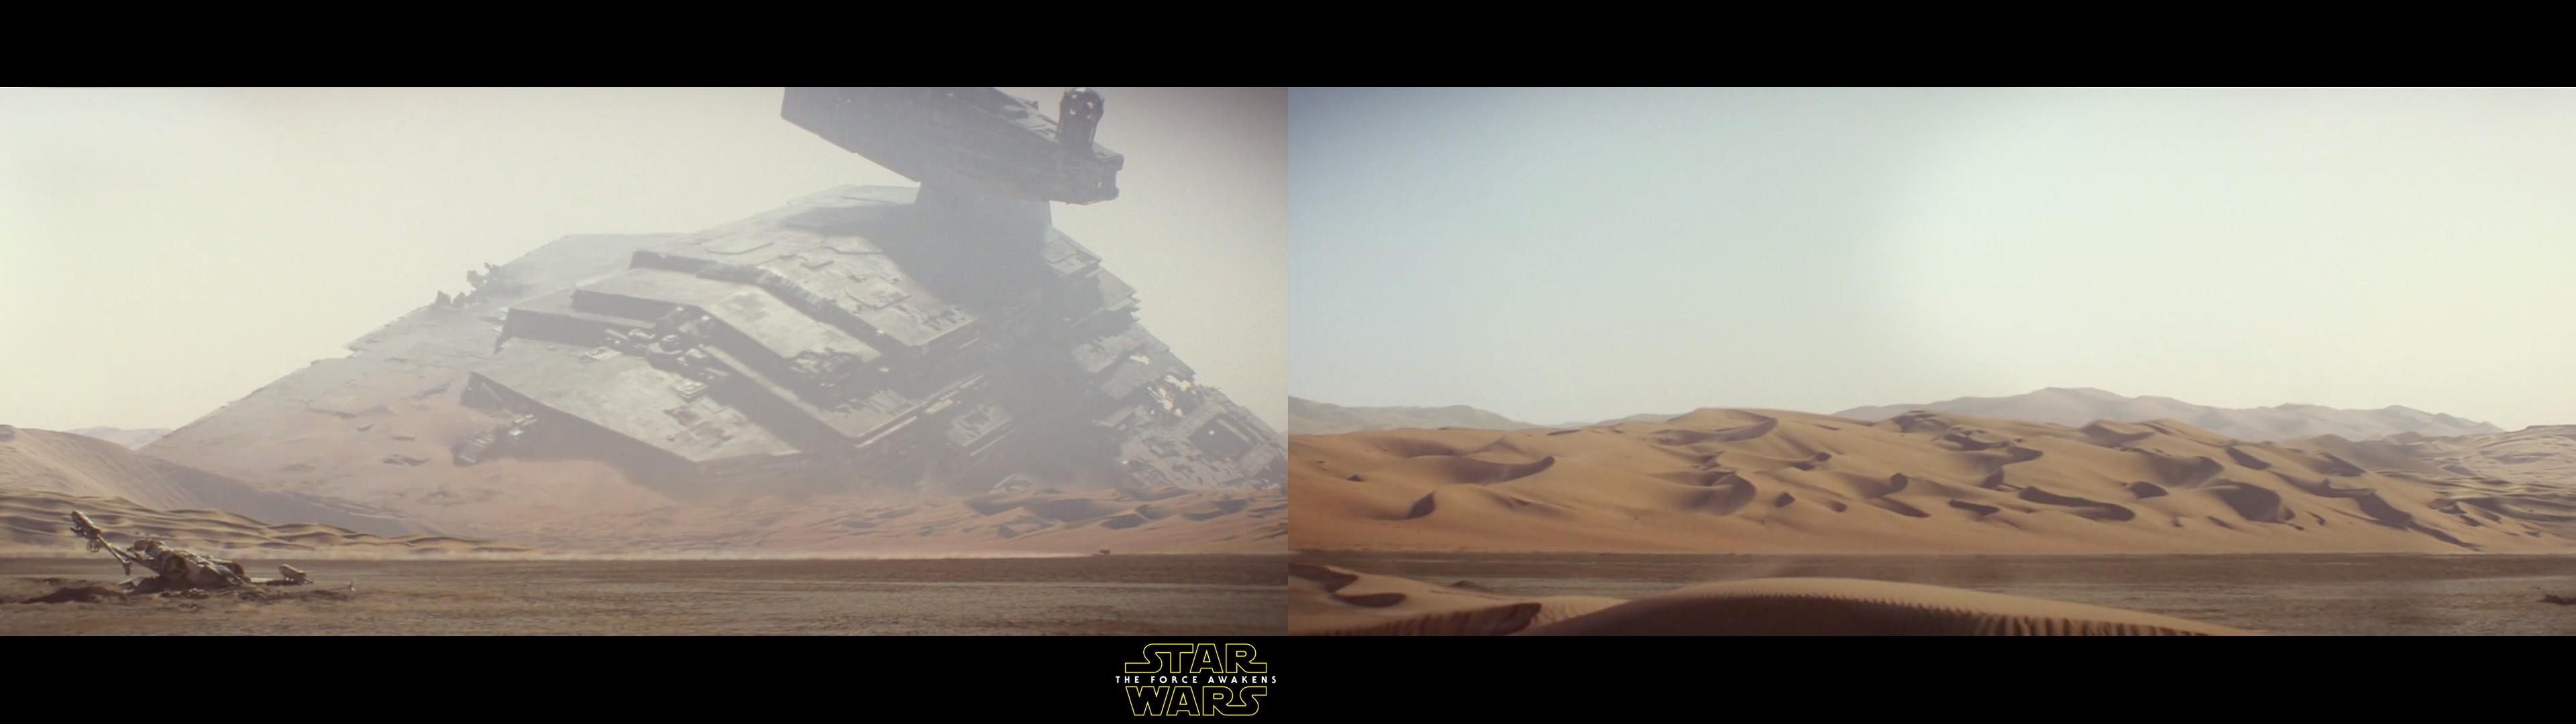 star wars 3 monitor wallpaper (22+ images)